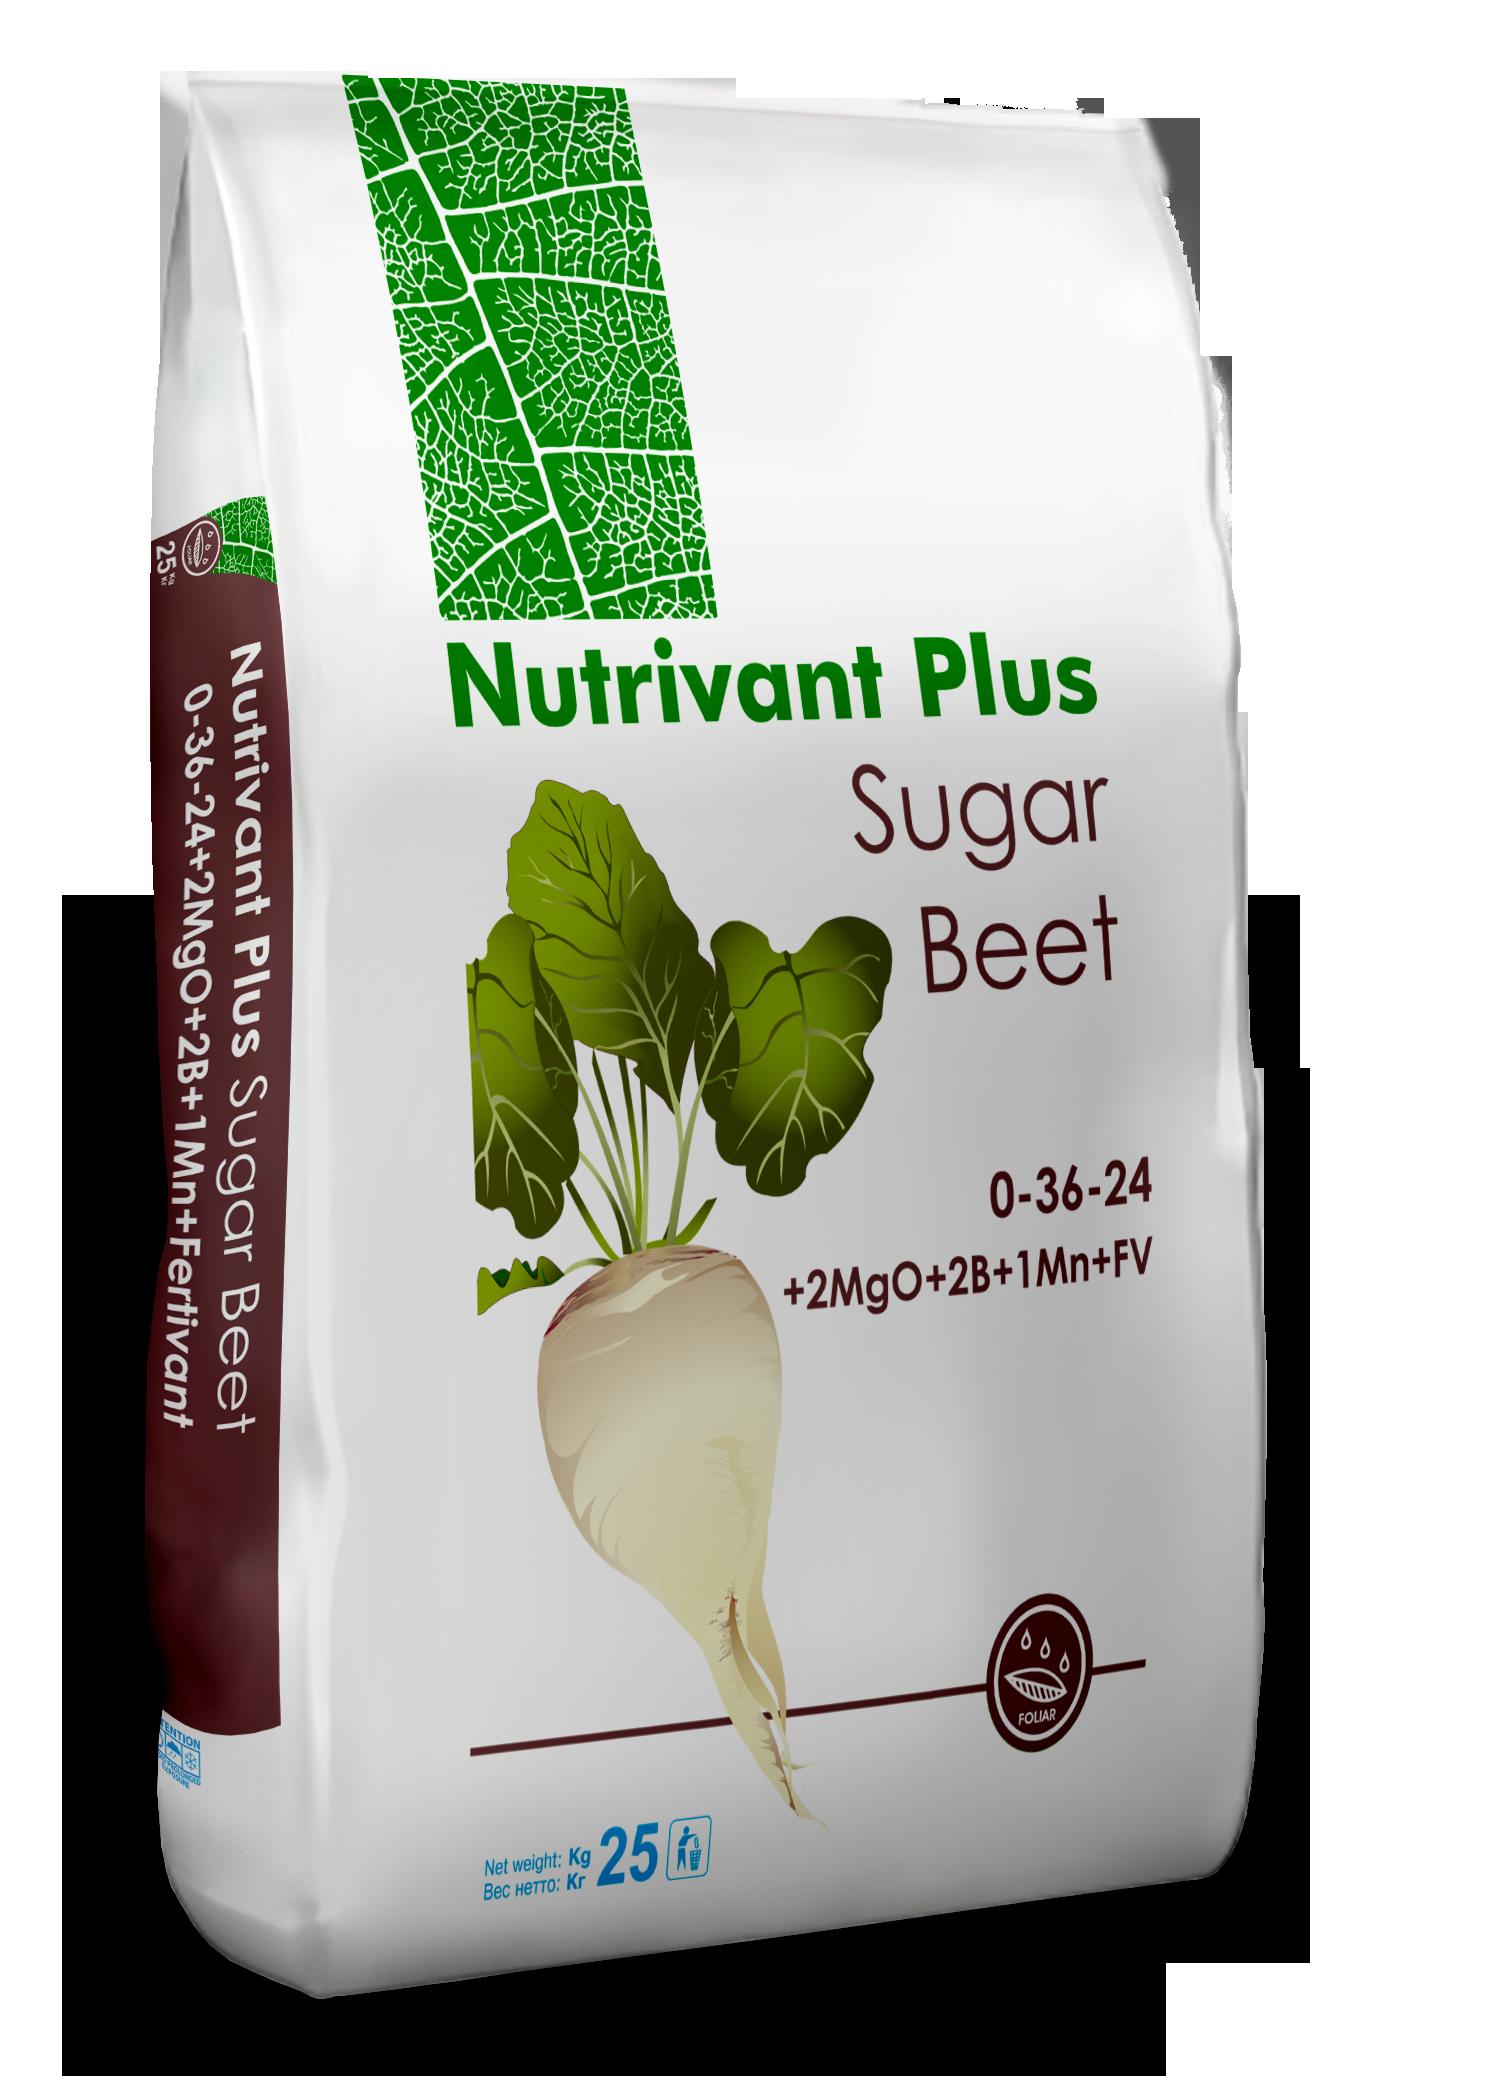 Nutrivant Plus Sugar Beet